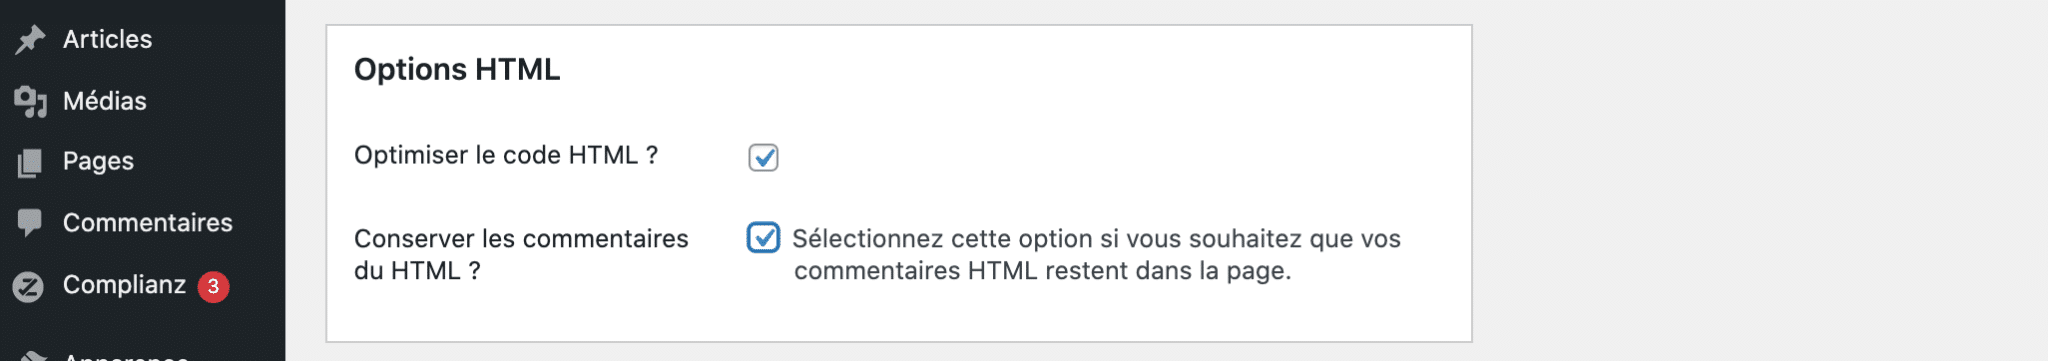 8 options html